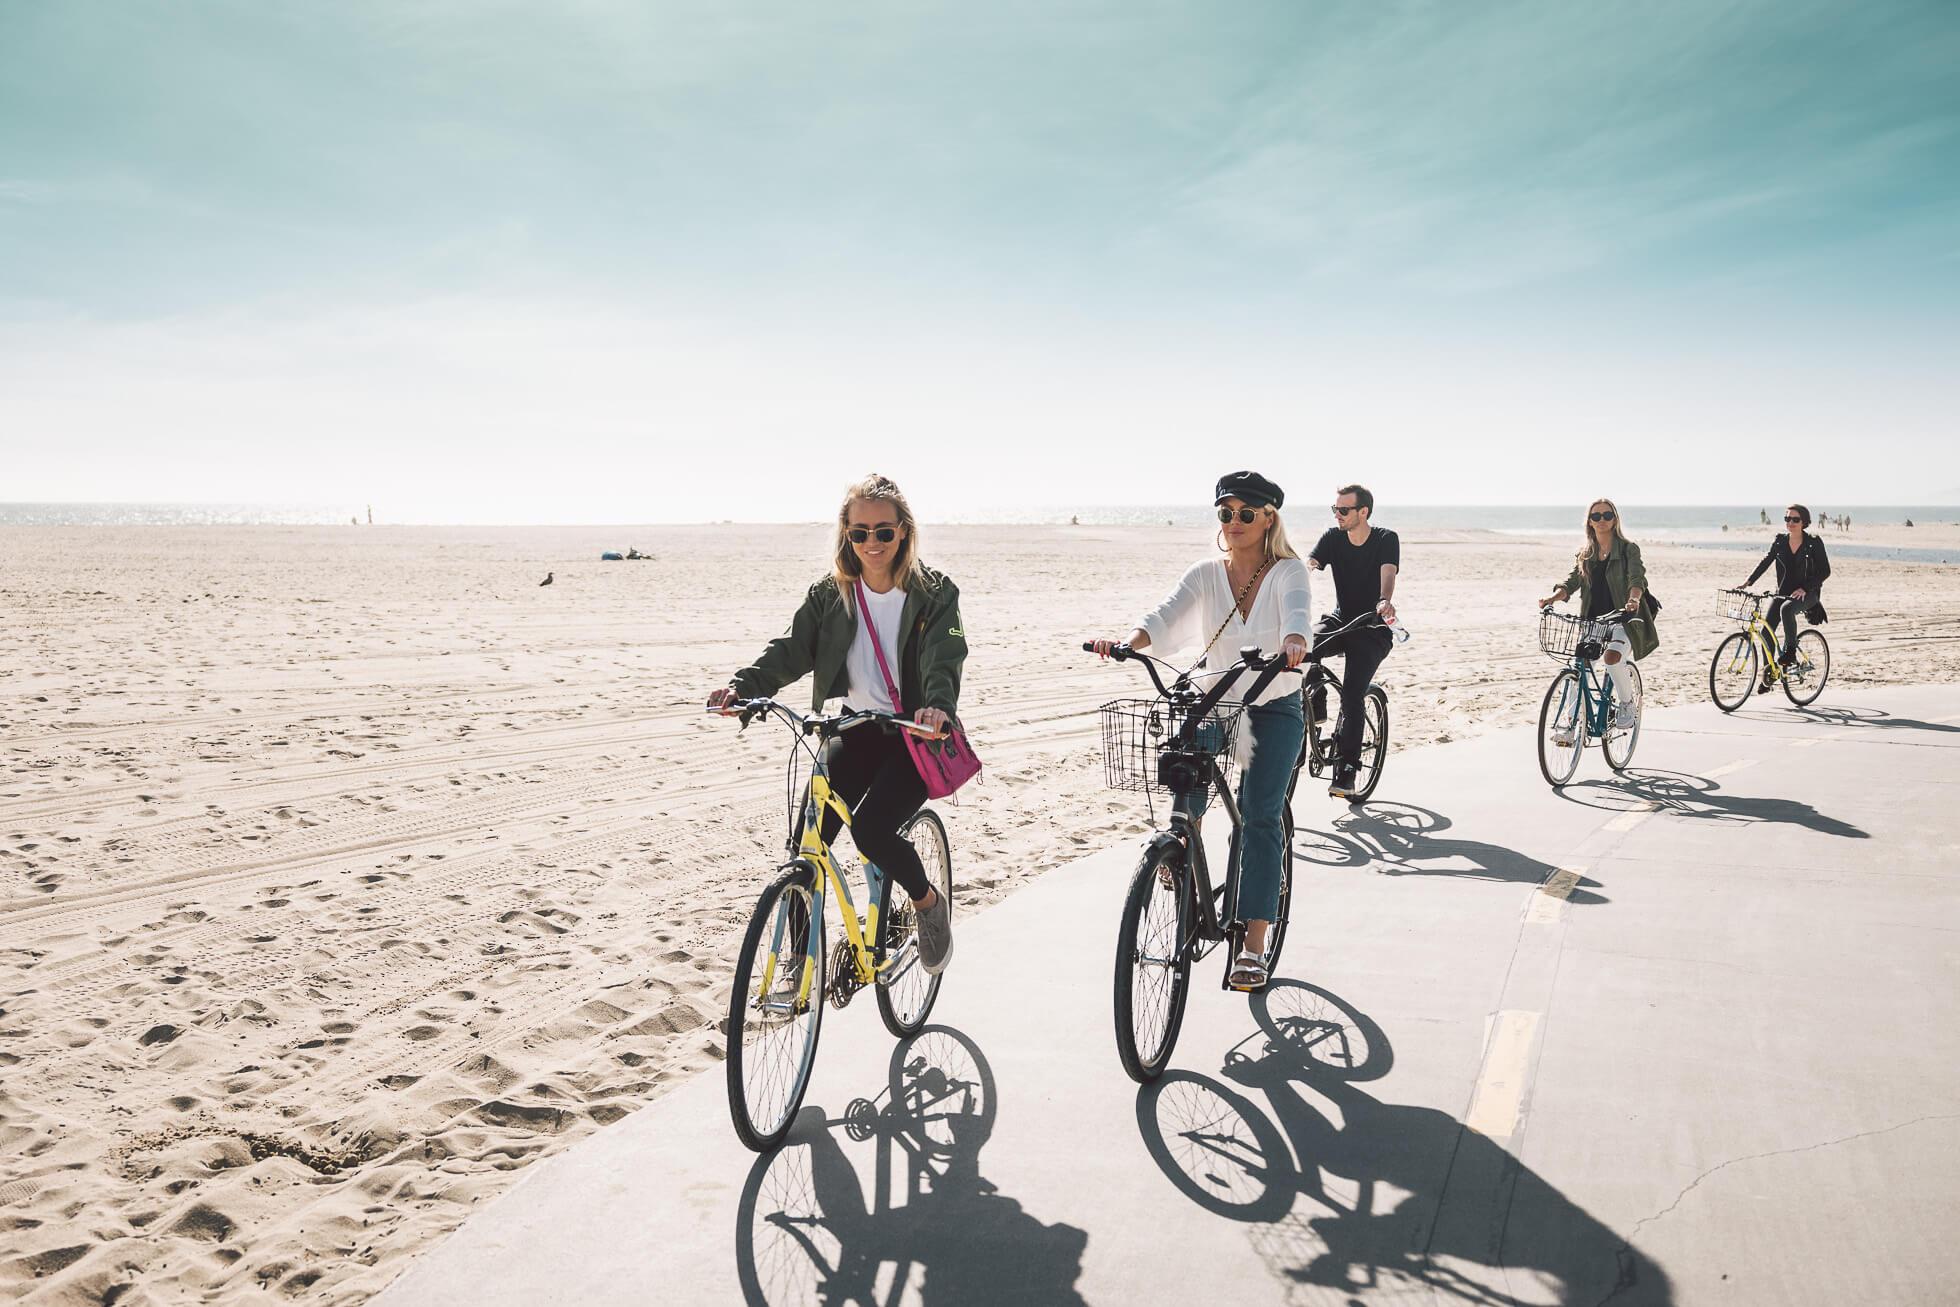 janni-deler-bike-ride-veniceL1010465